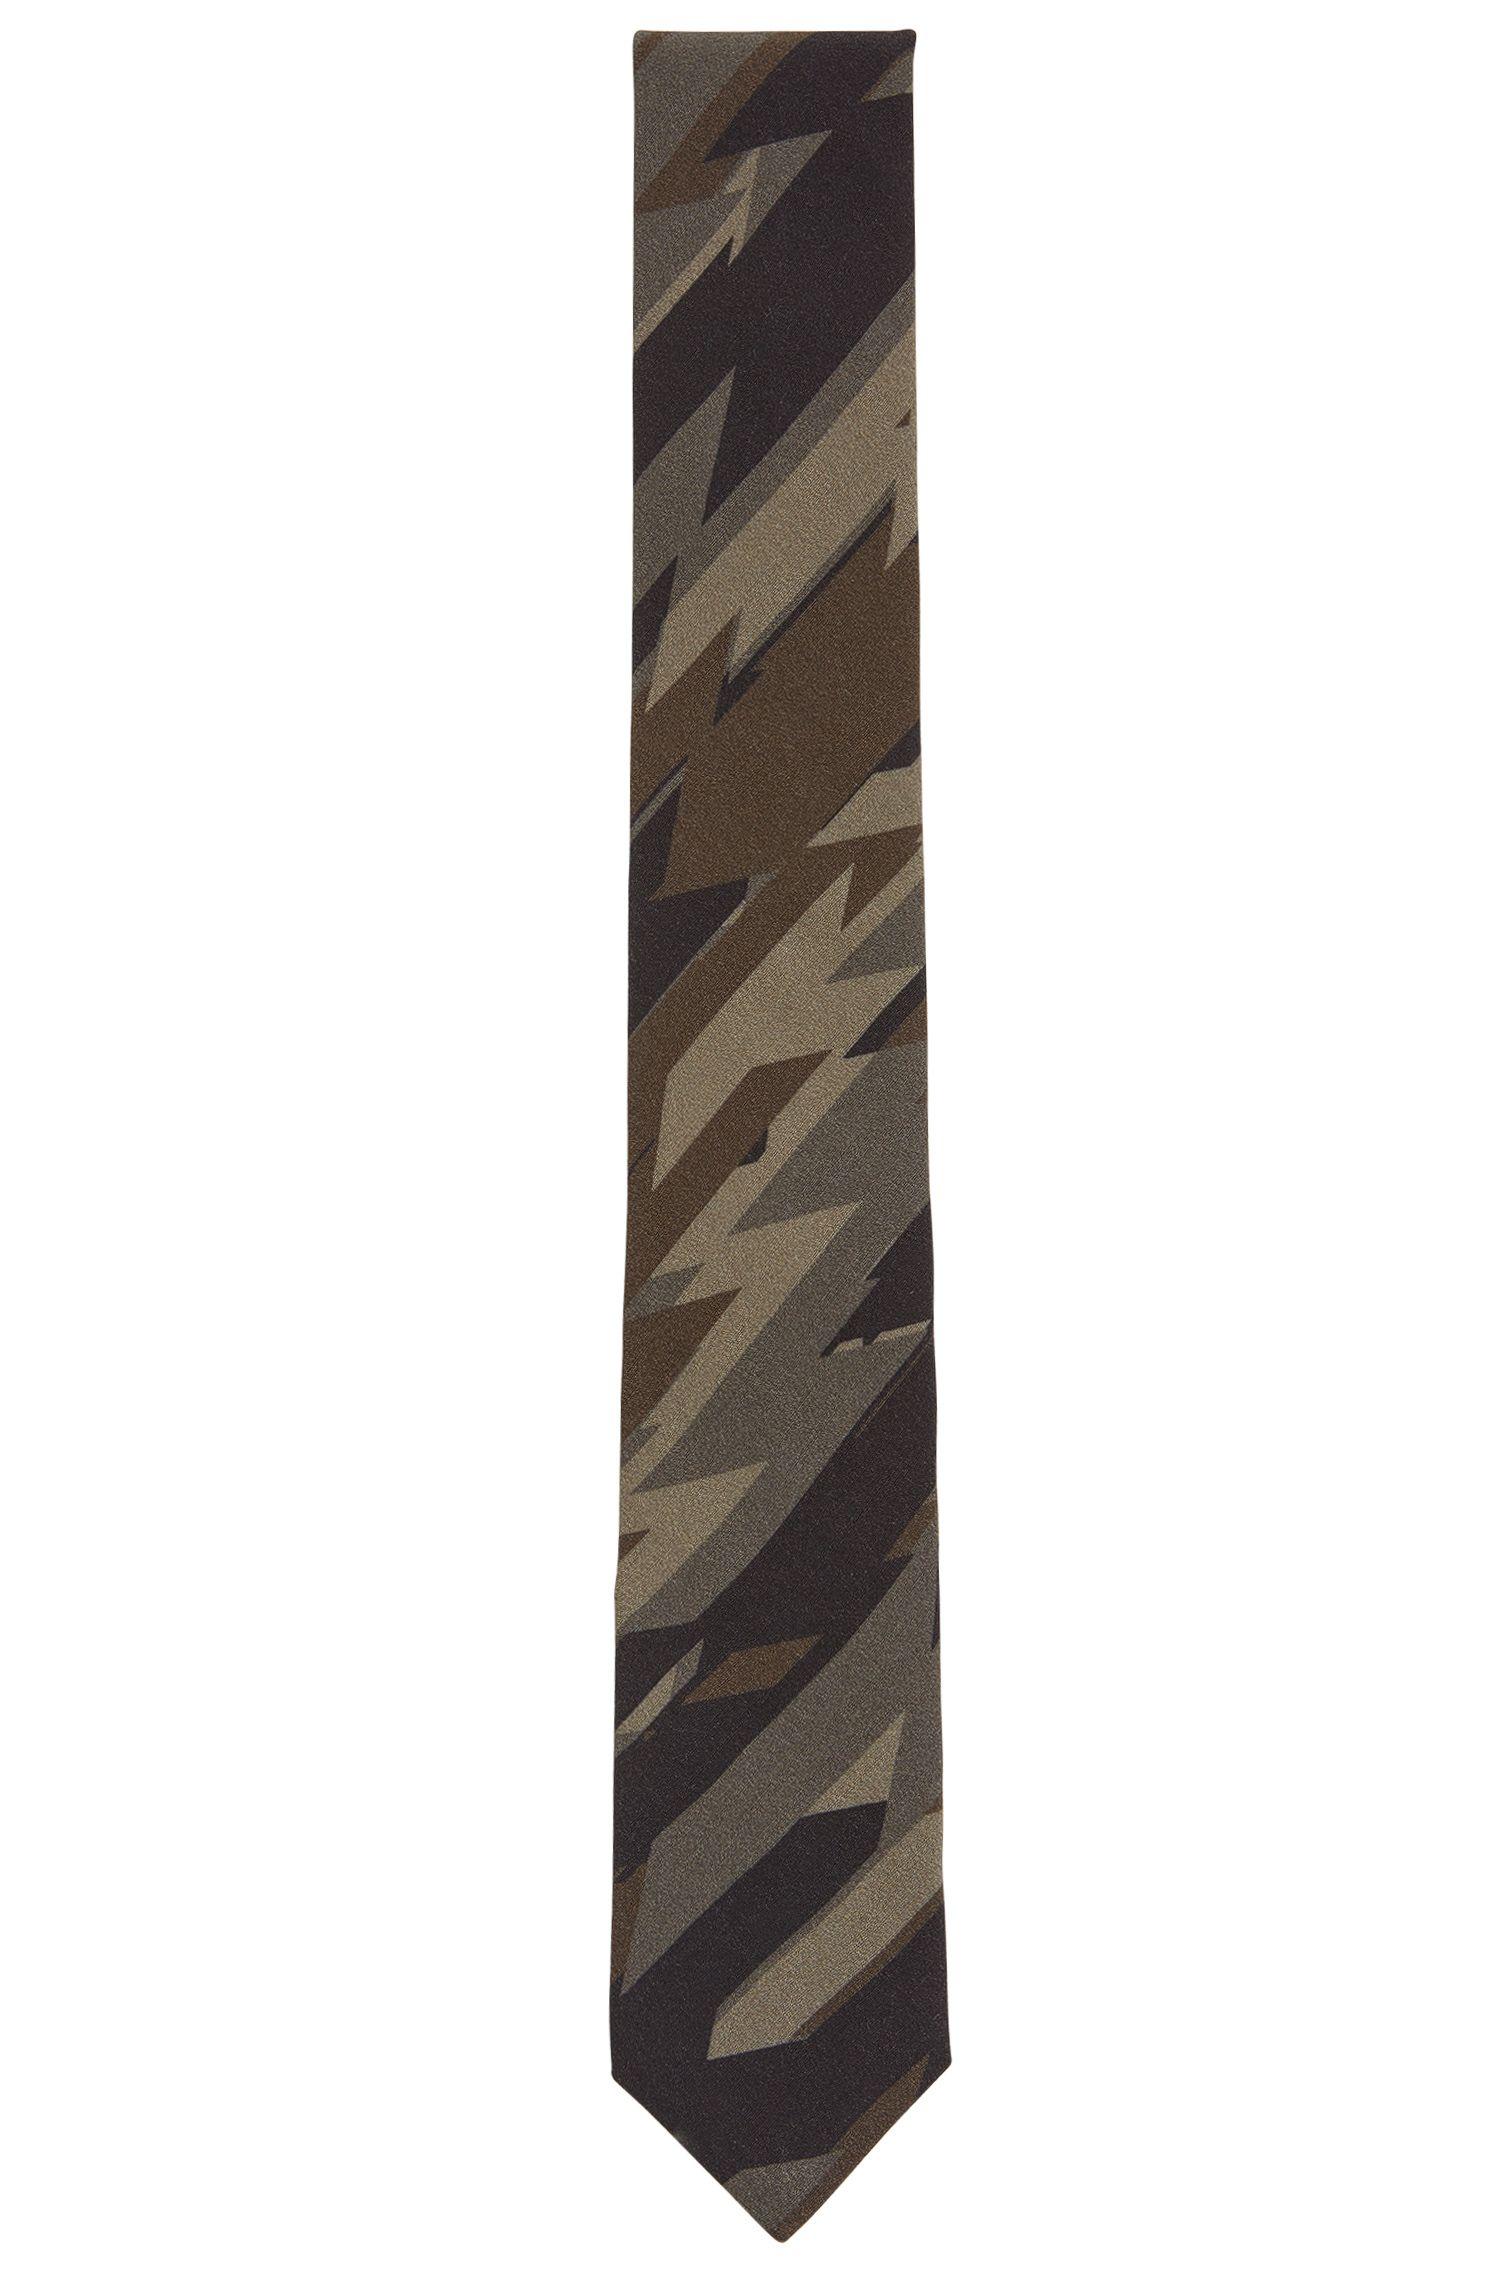 Camouflage print tie